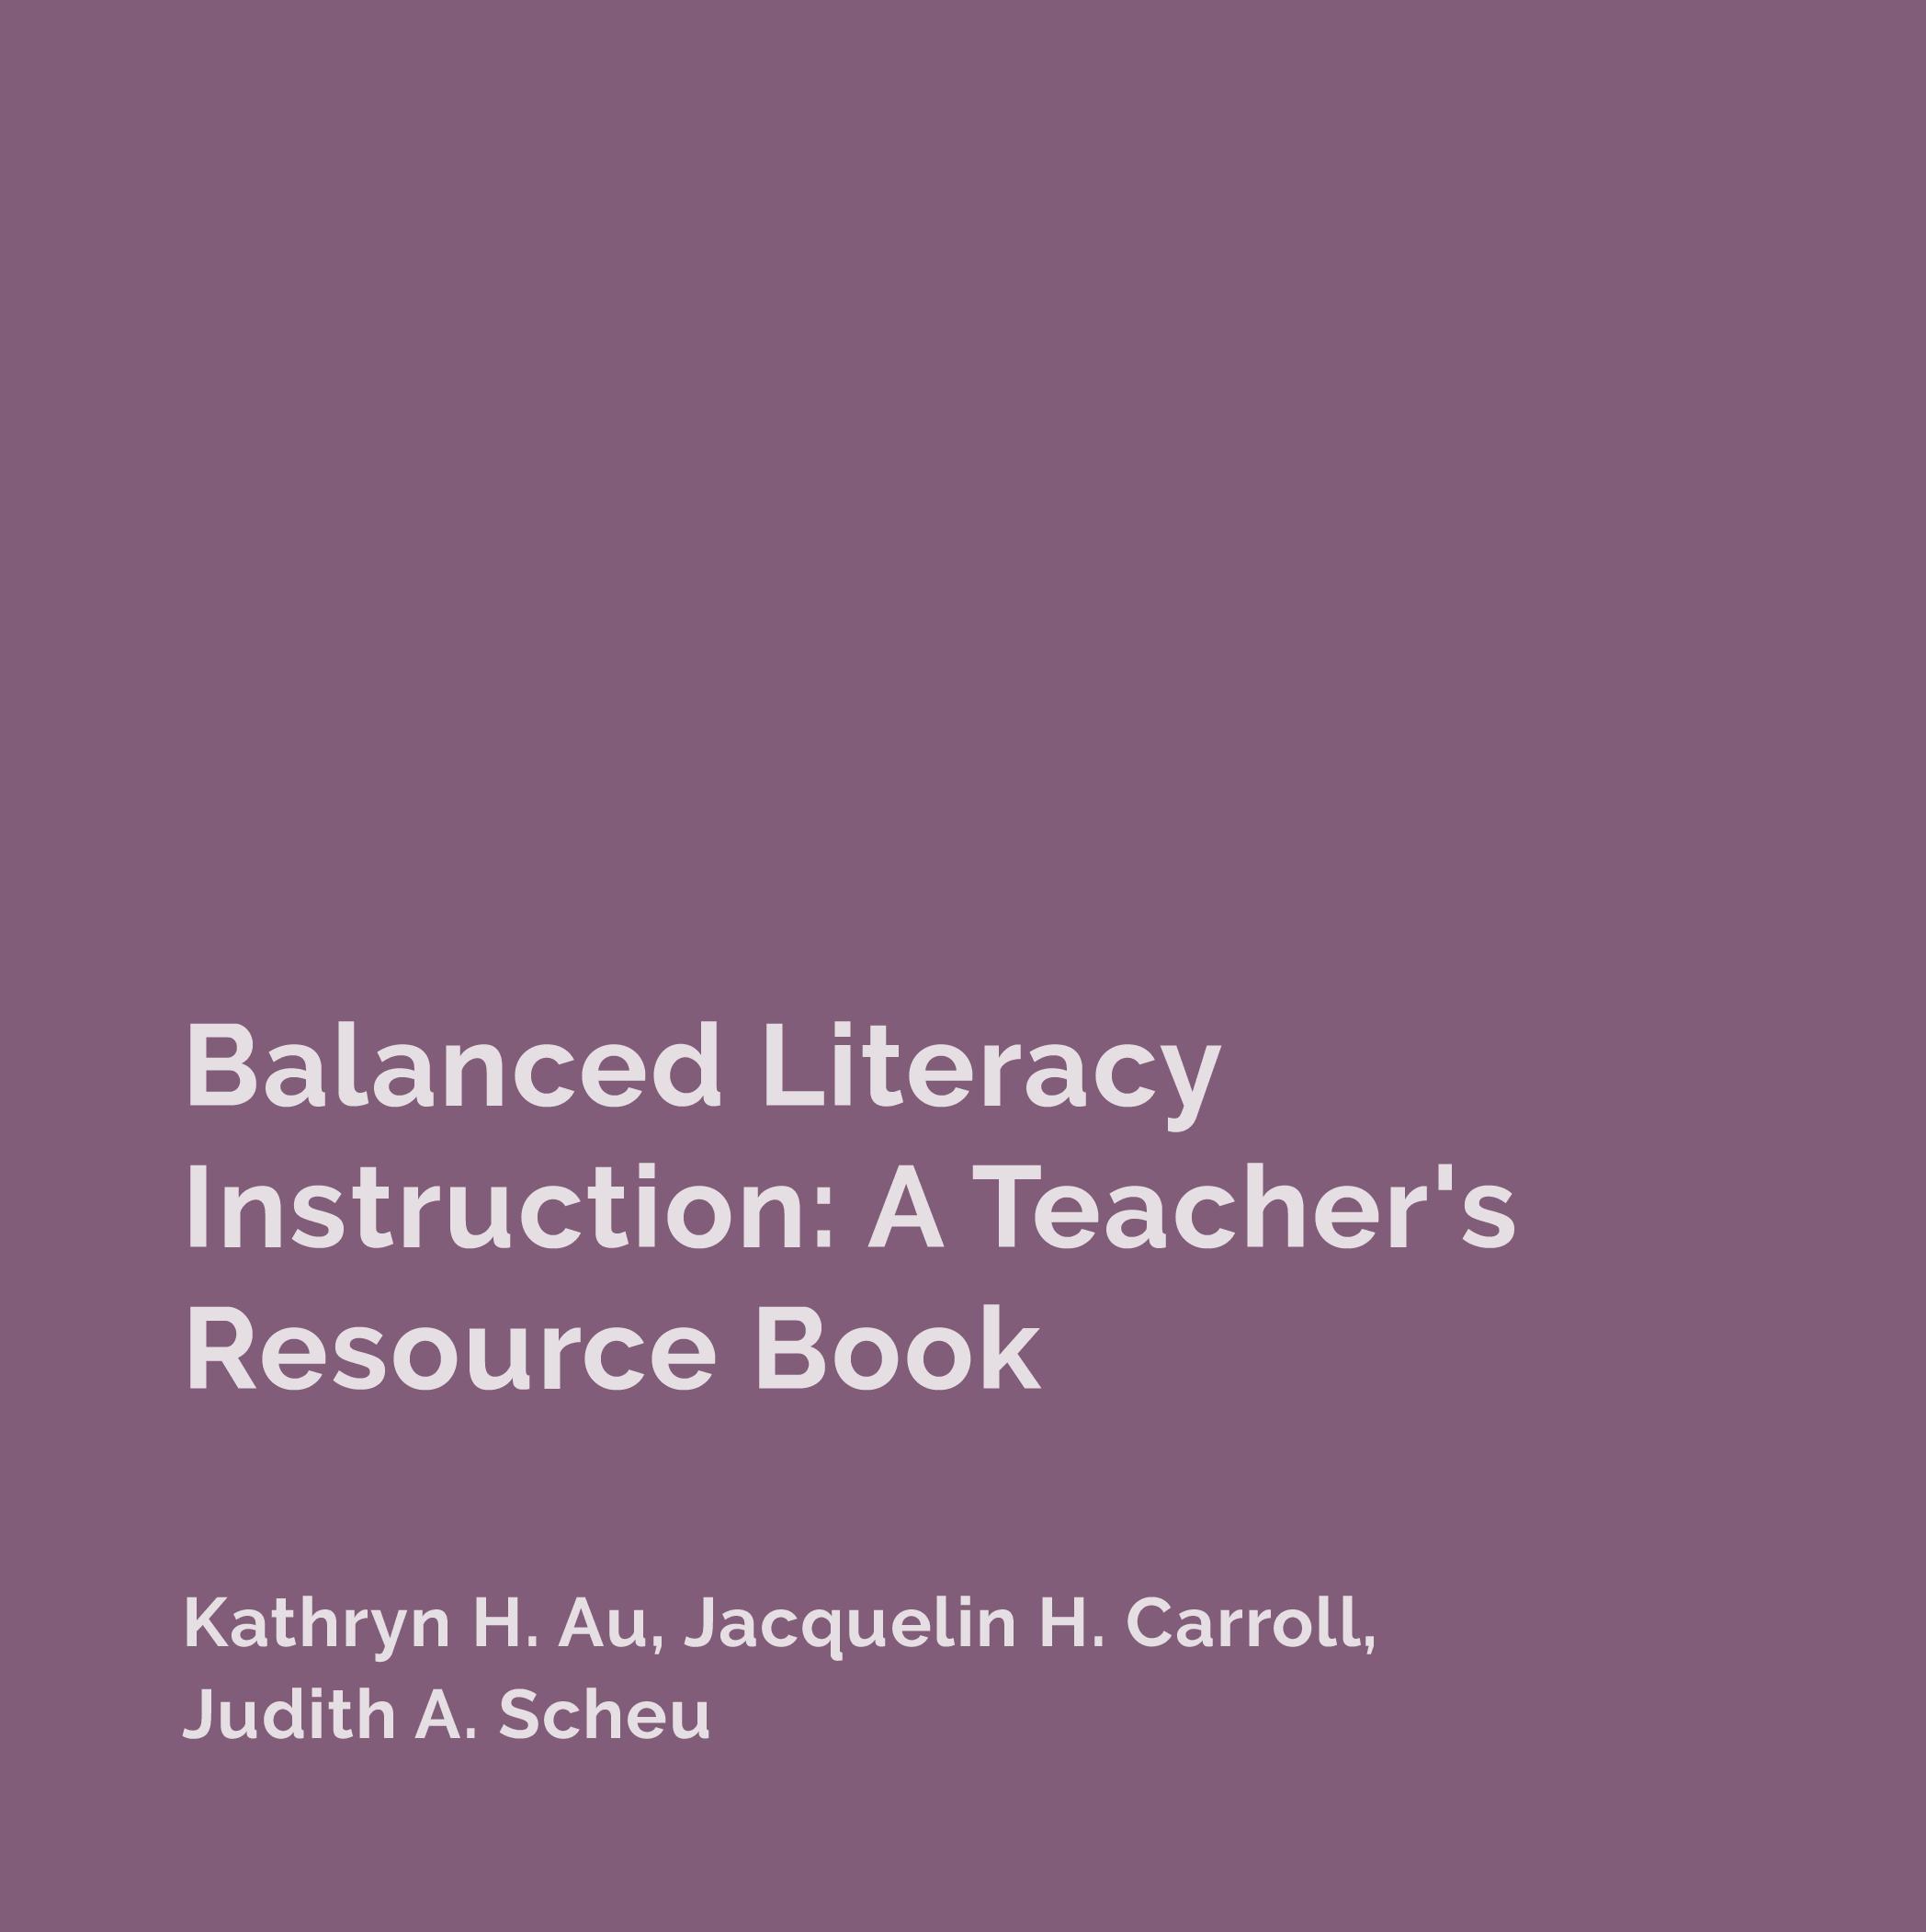 BalancedLiteracy_SS-min.png